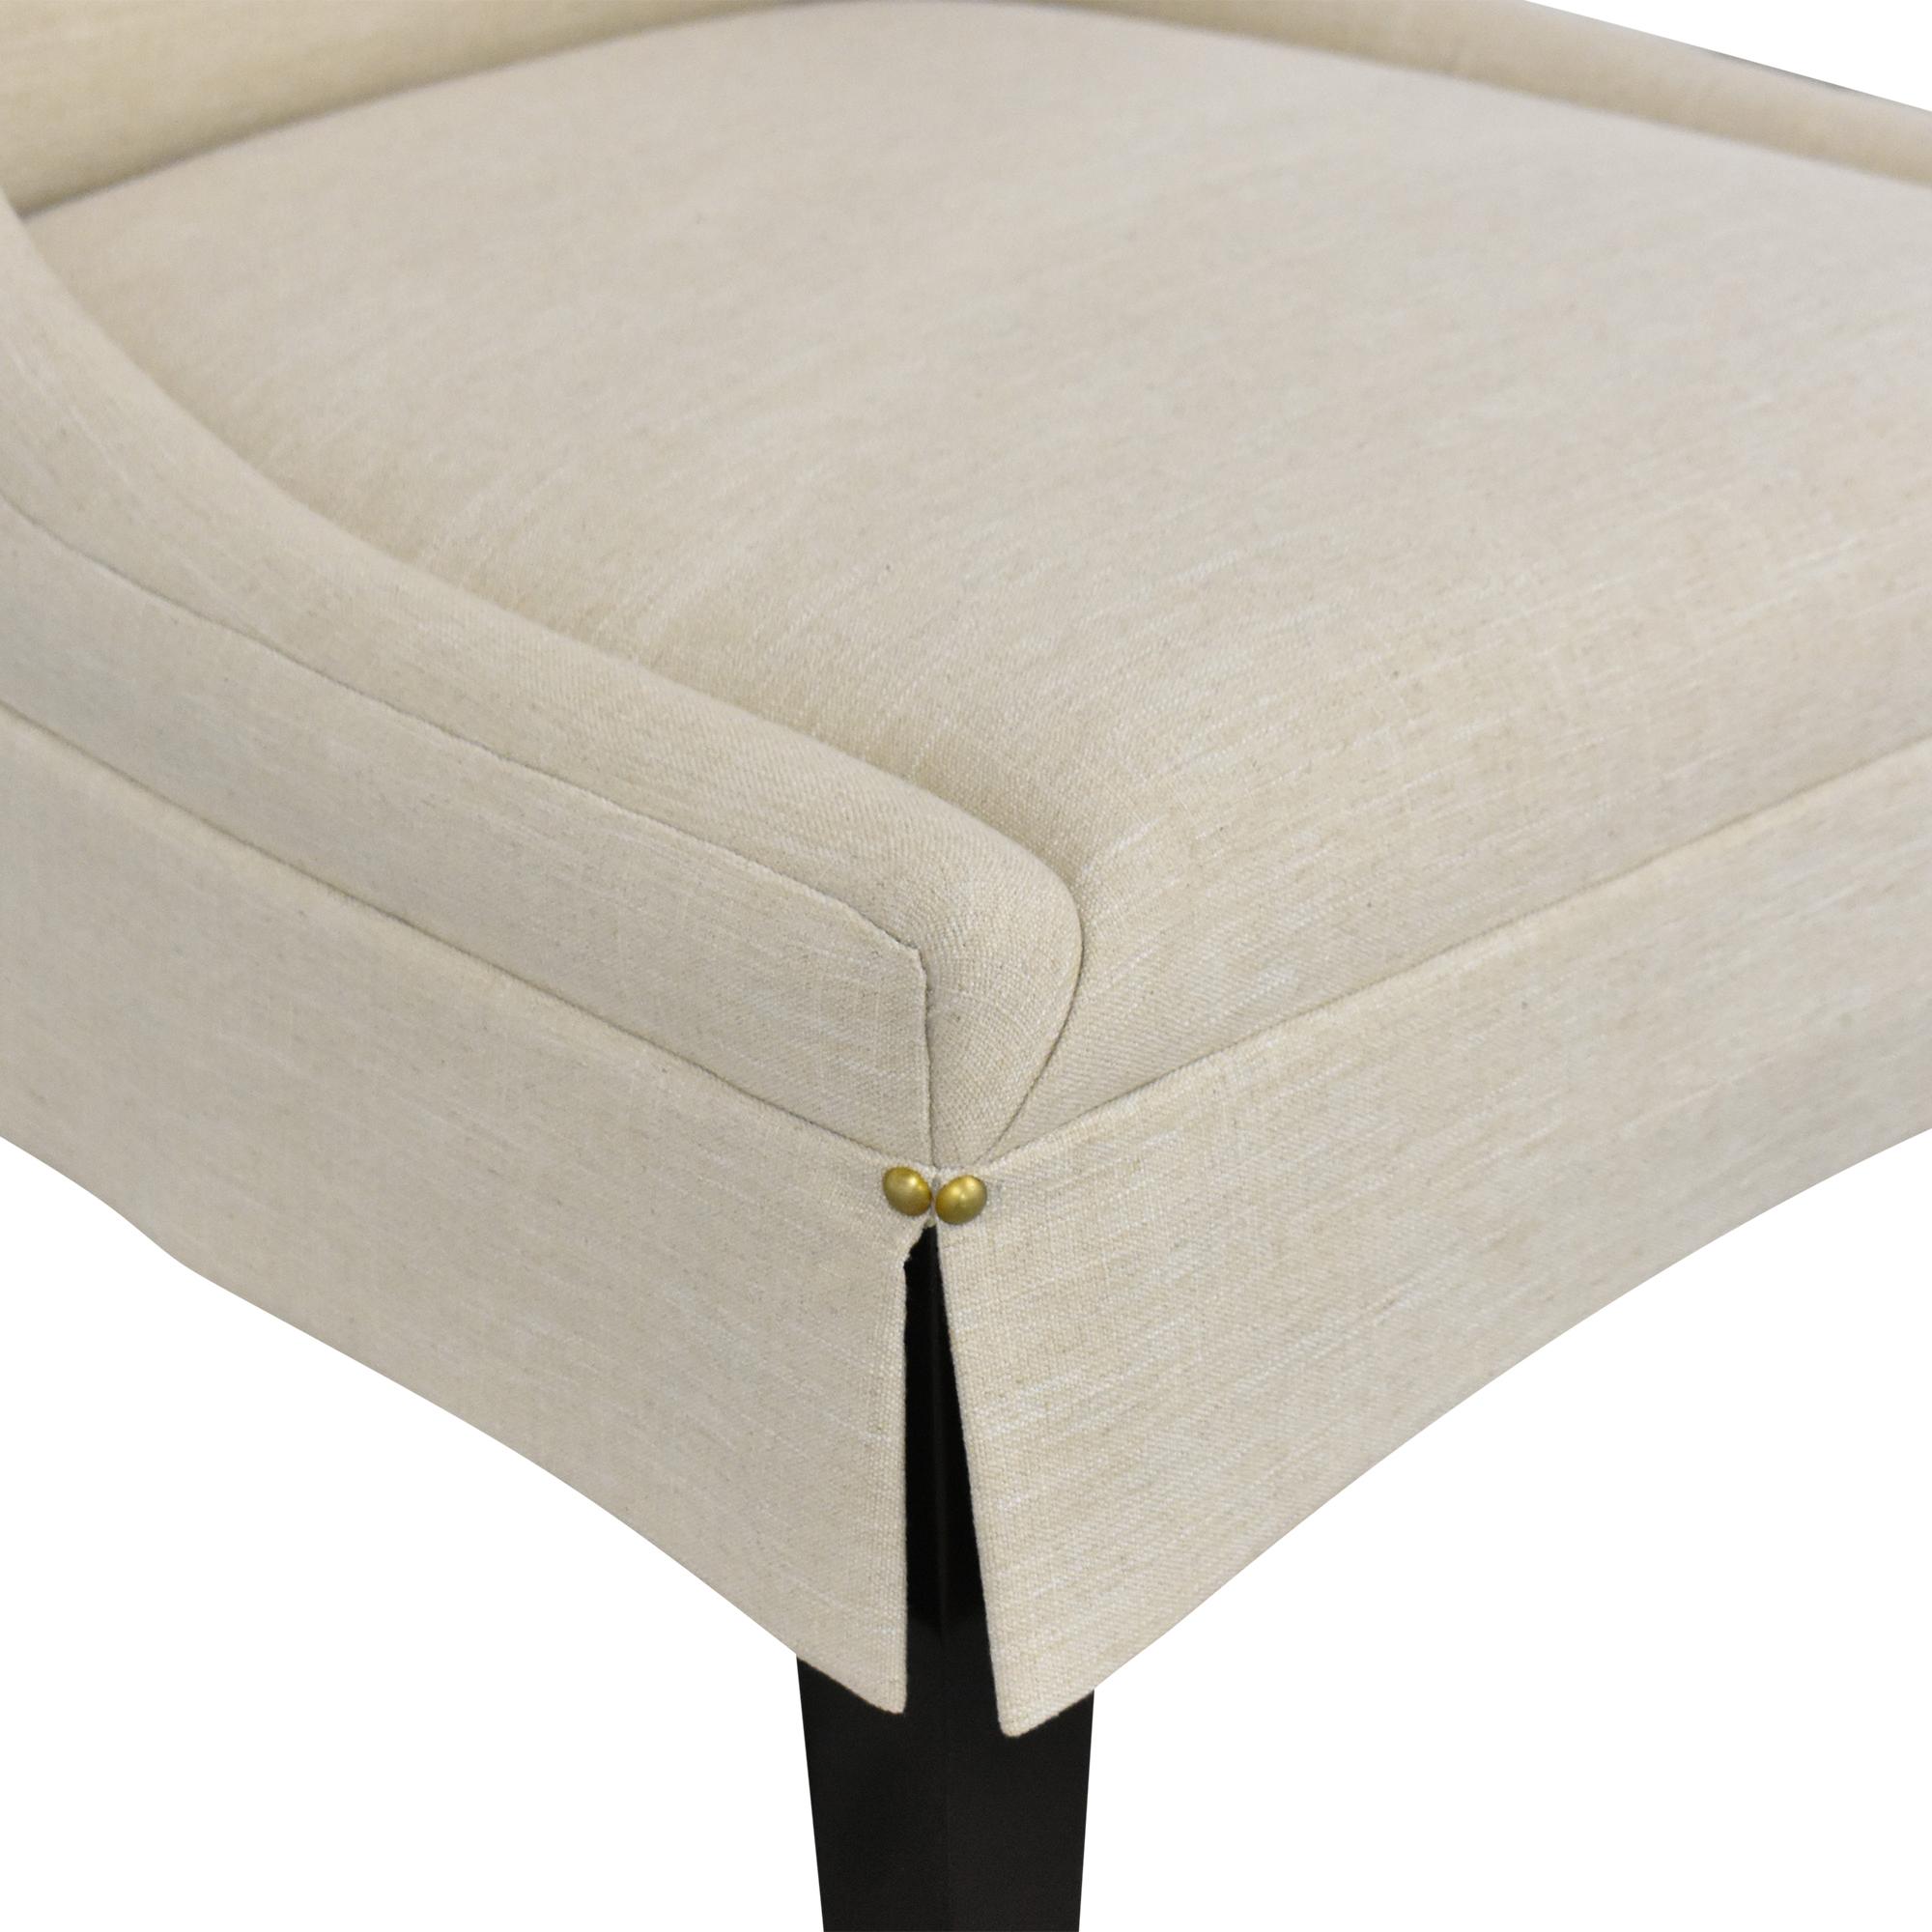 Lexington Furniture Lexington Furniture Carlyle Upholstered Parsons Chair ct